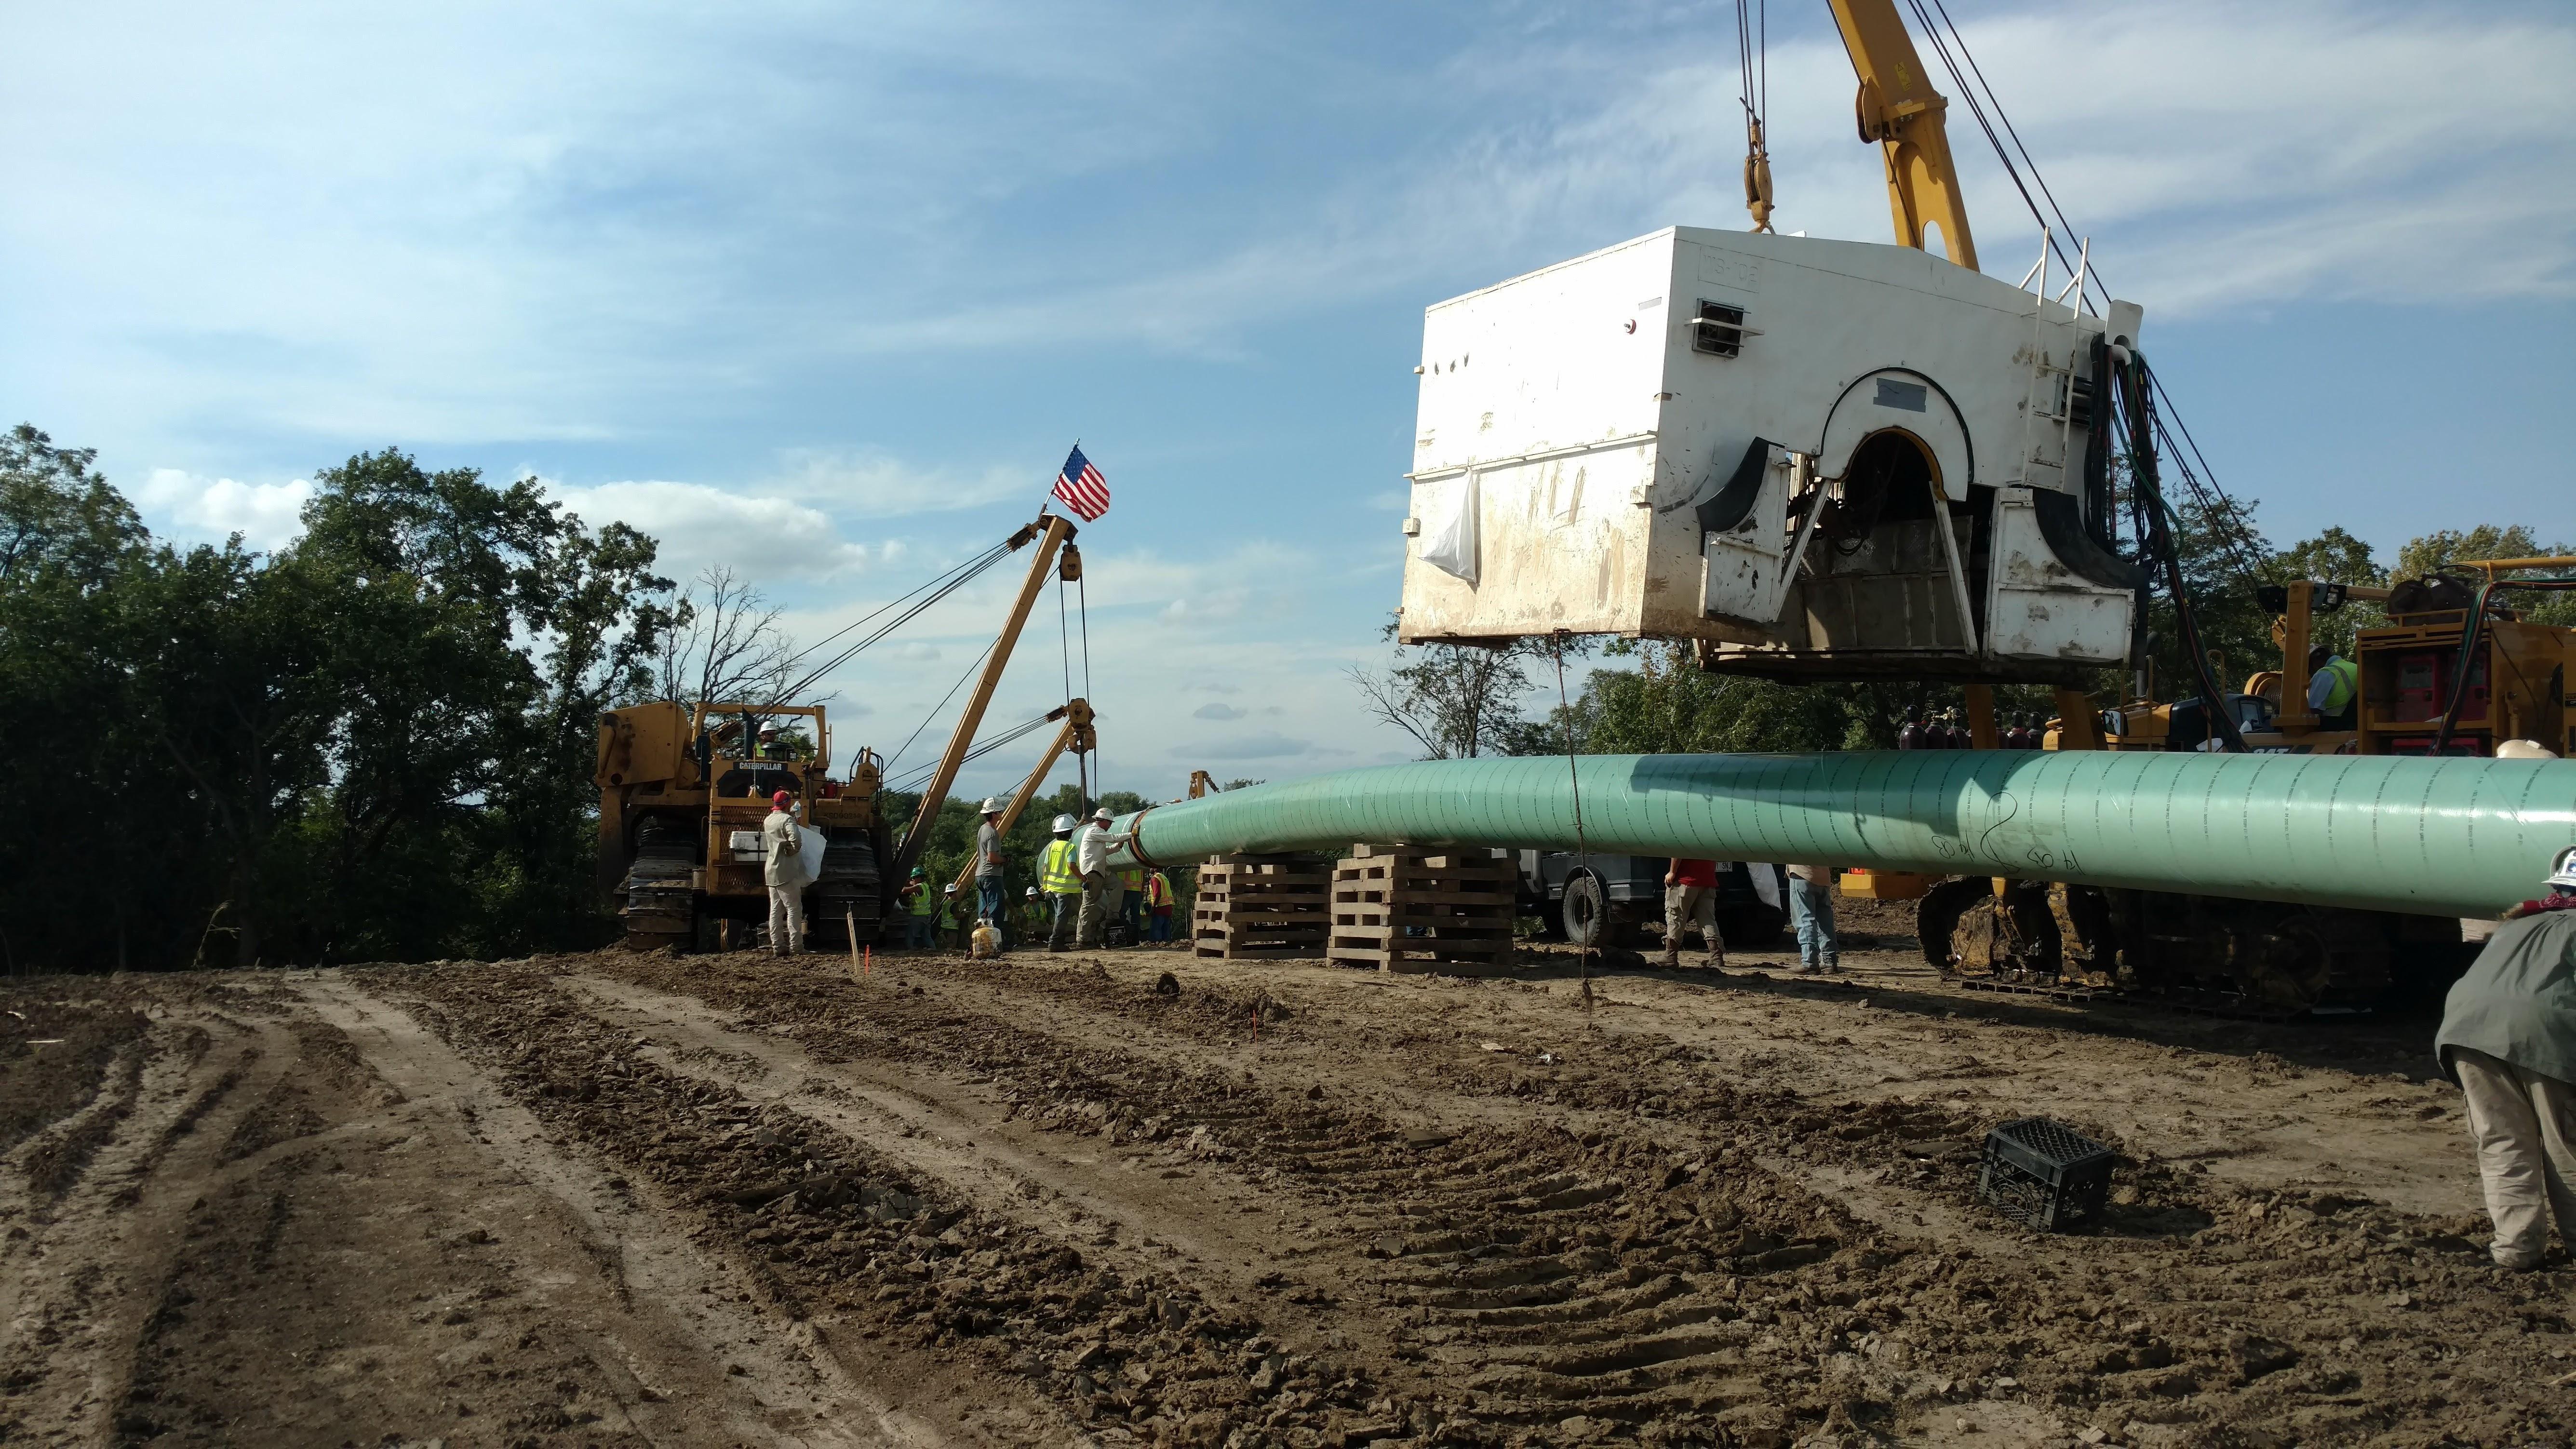 Setting An Automatic Welding Shack Crc Evans On The Dakota Access Pipeline Dakota Access Welding Settings